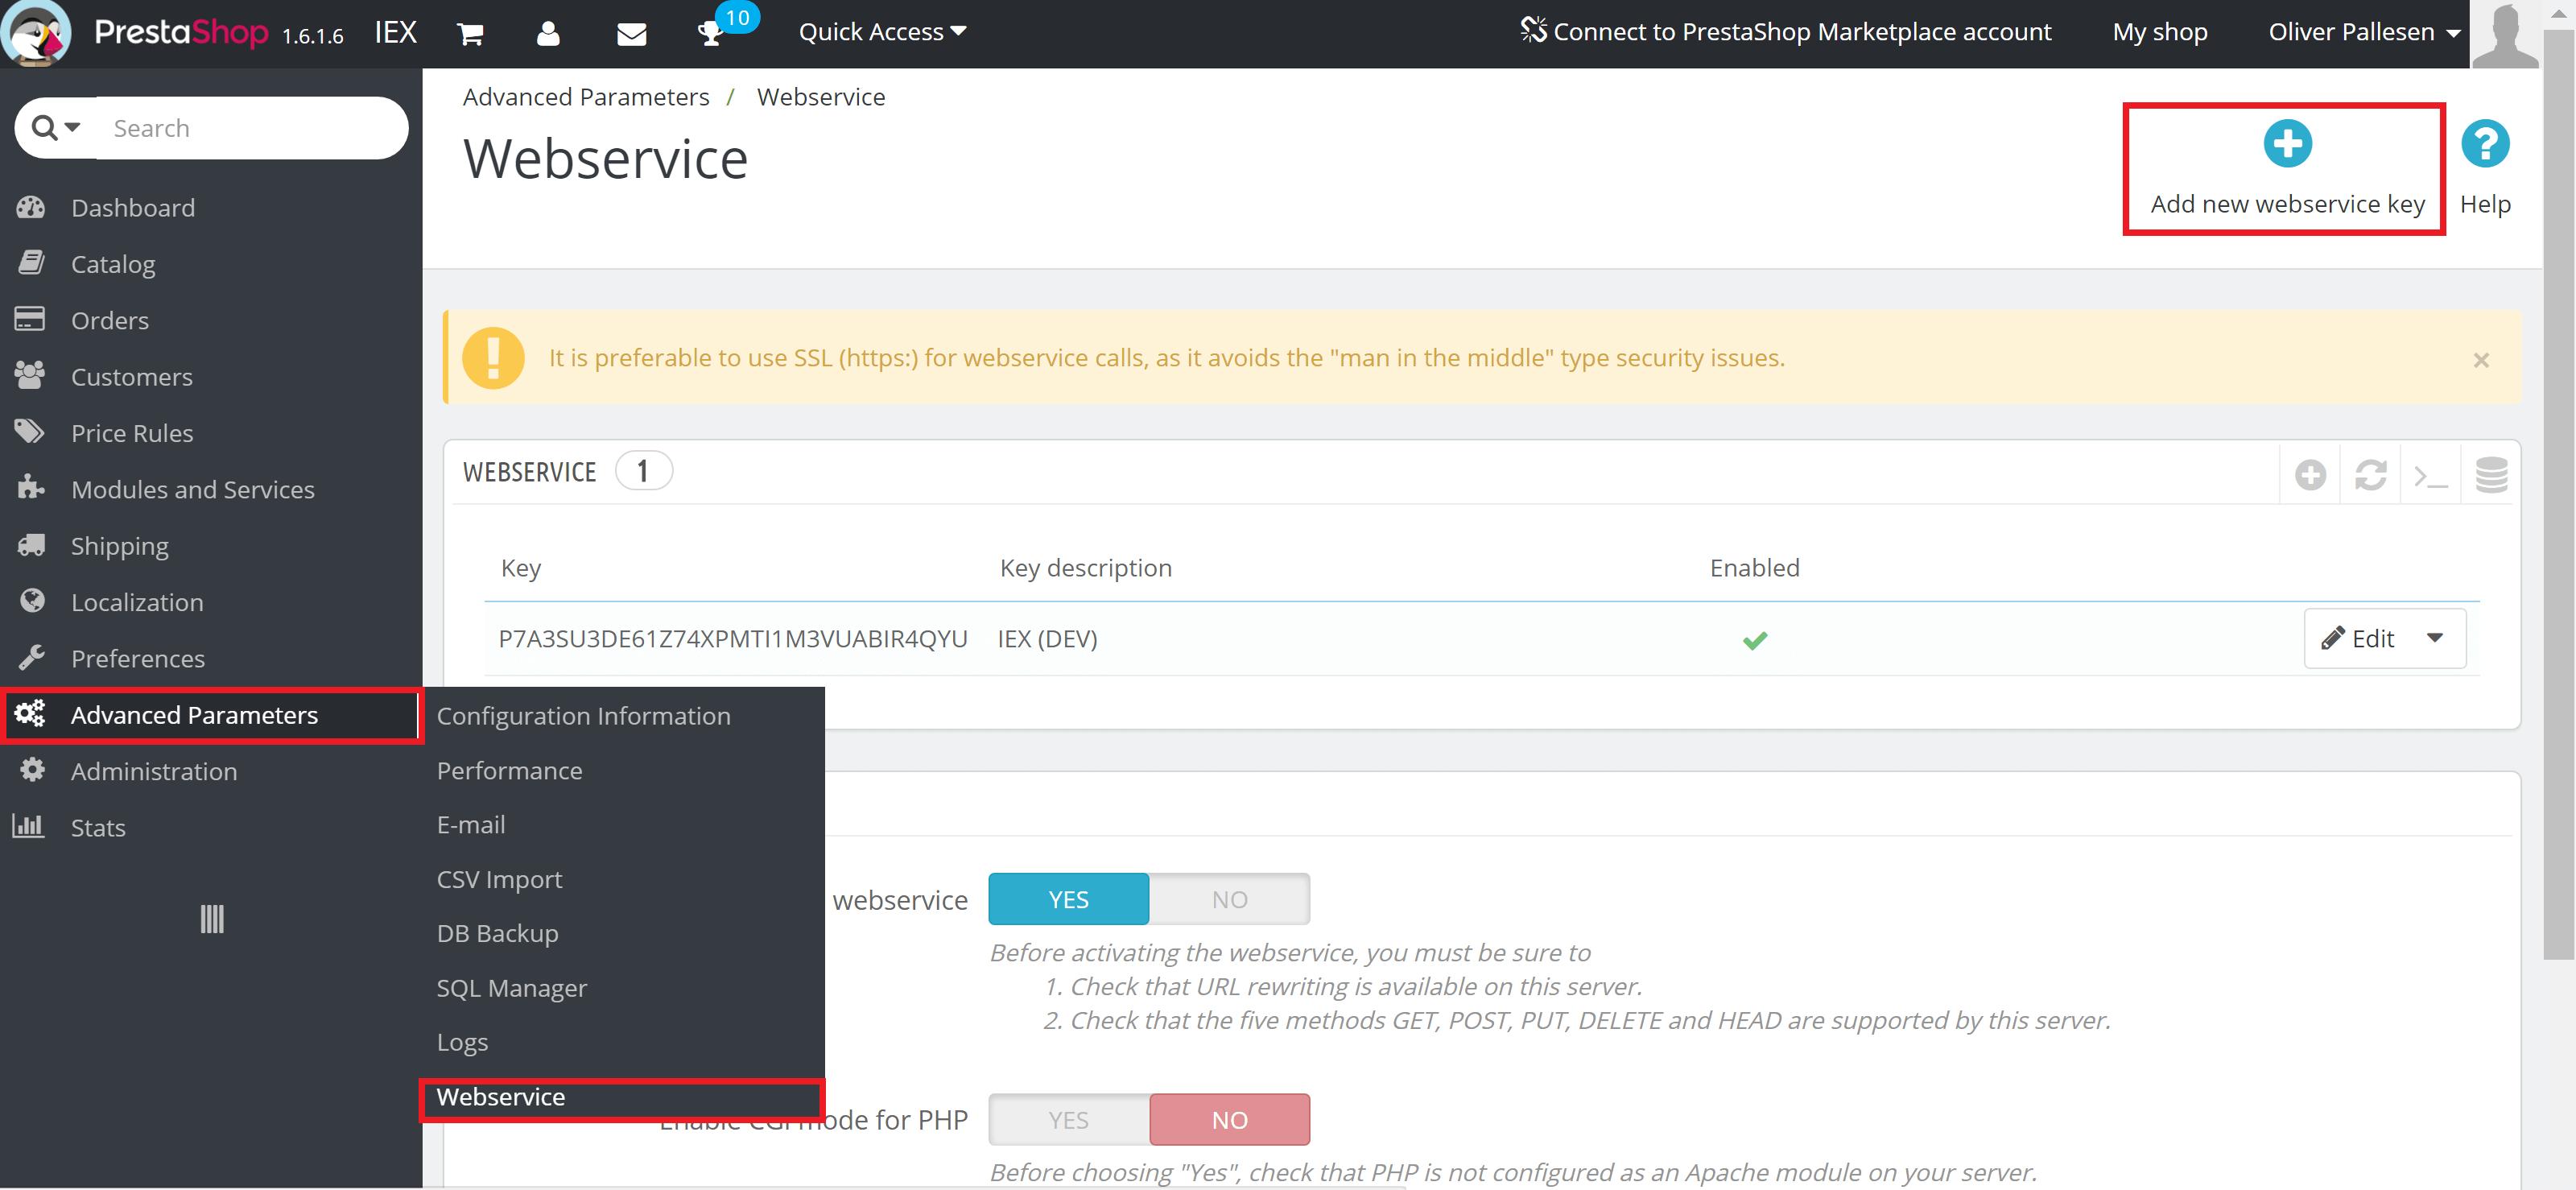 Installer modulet